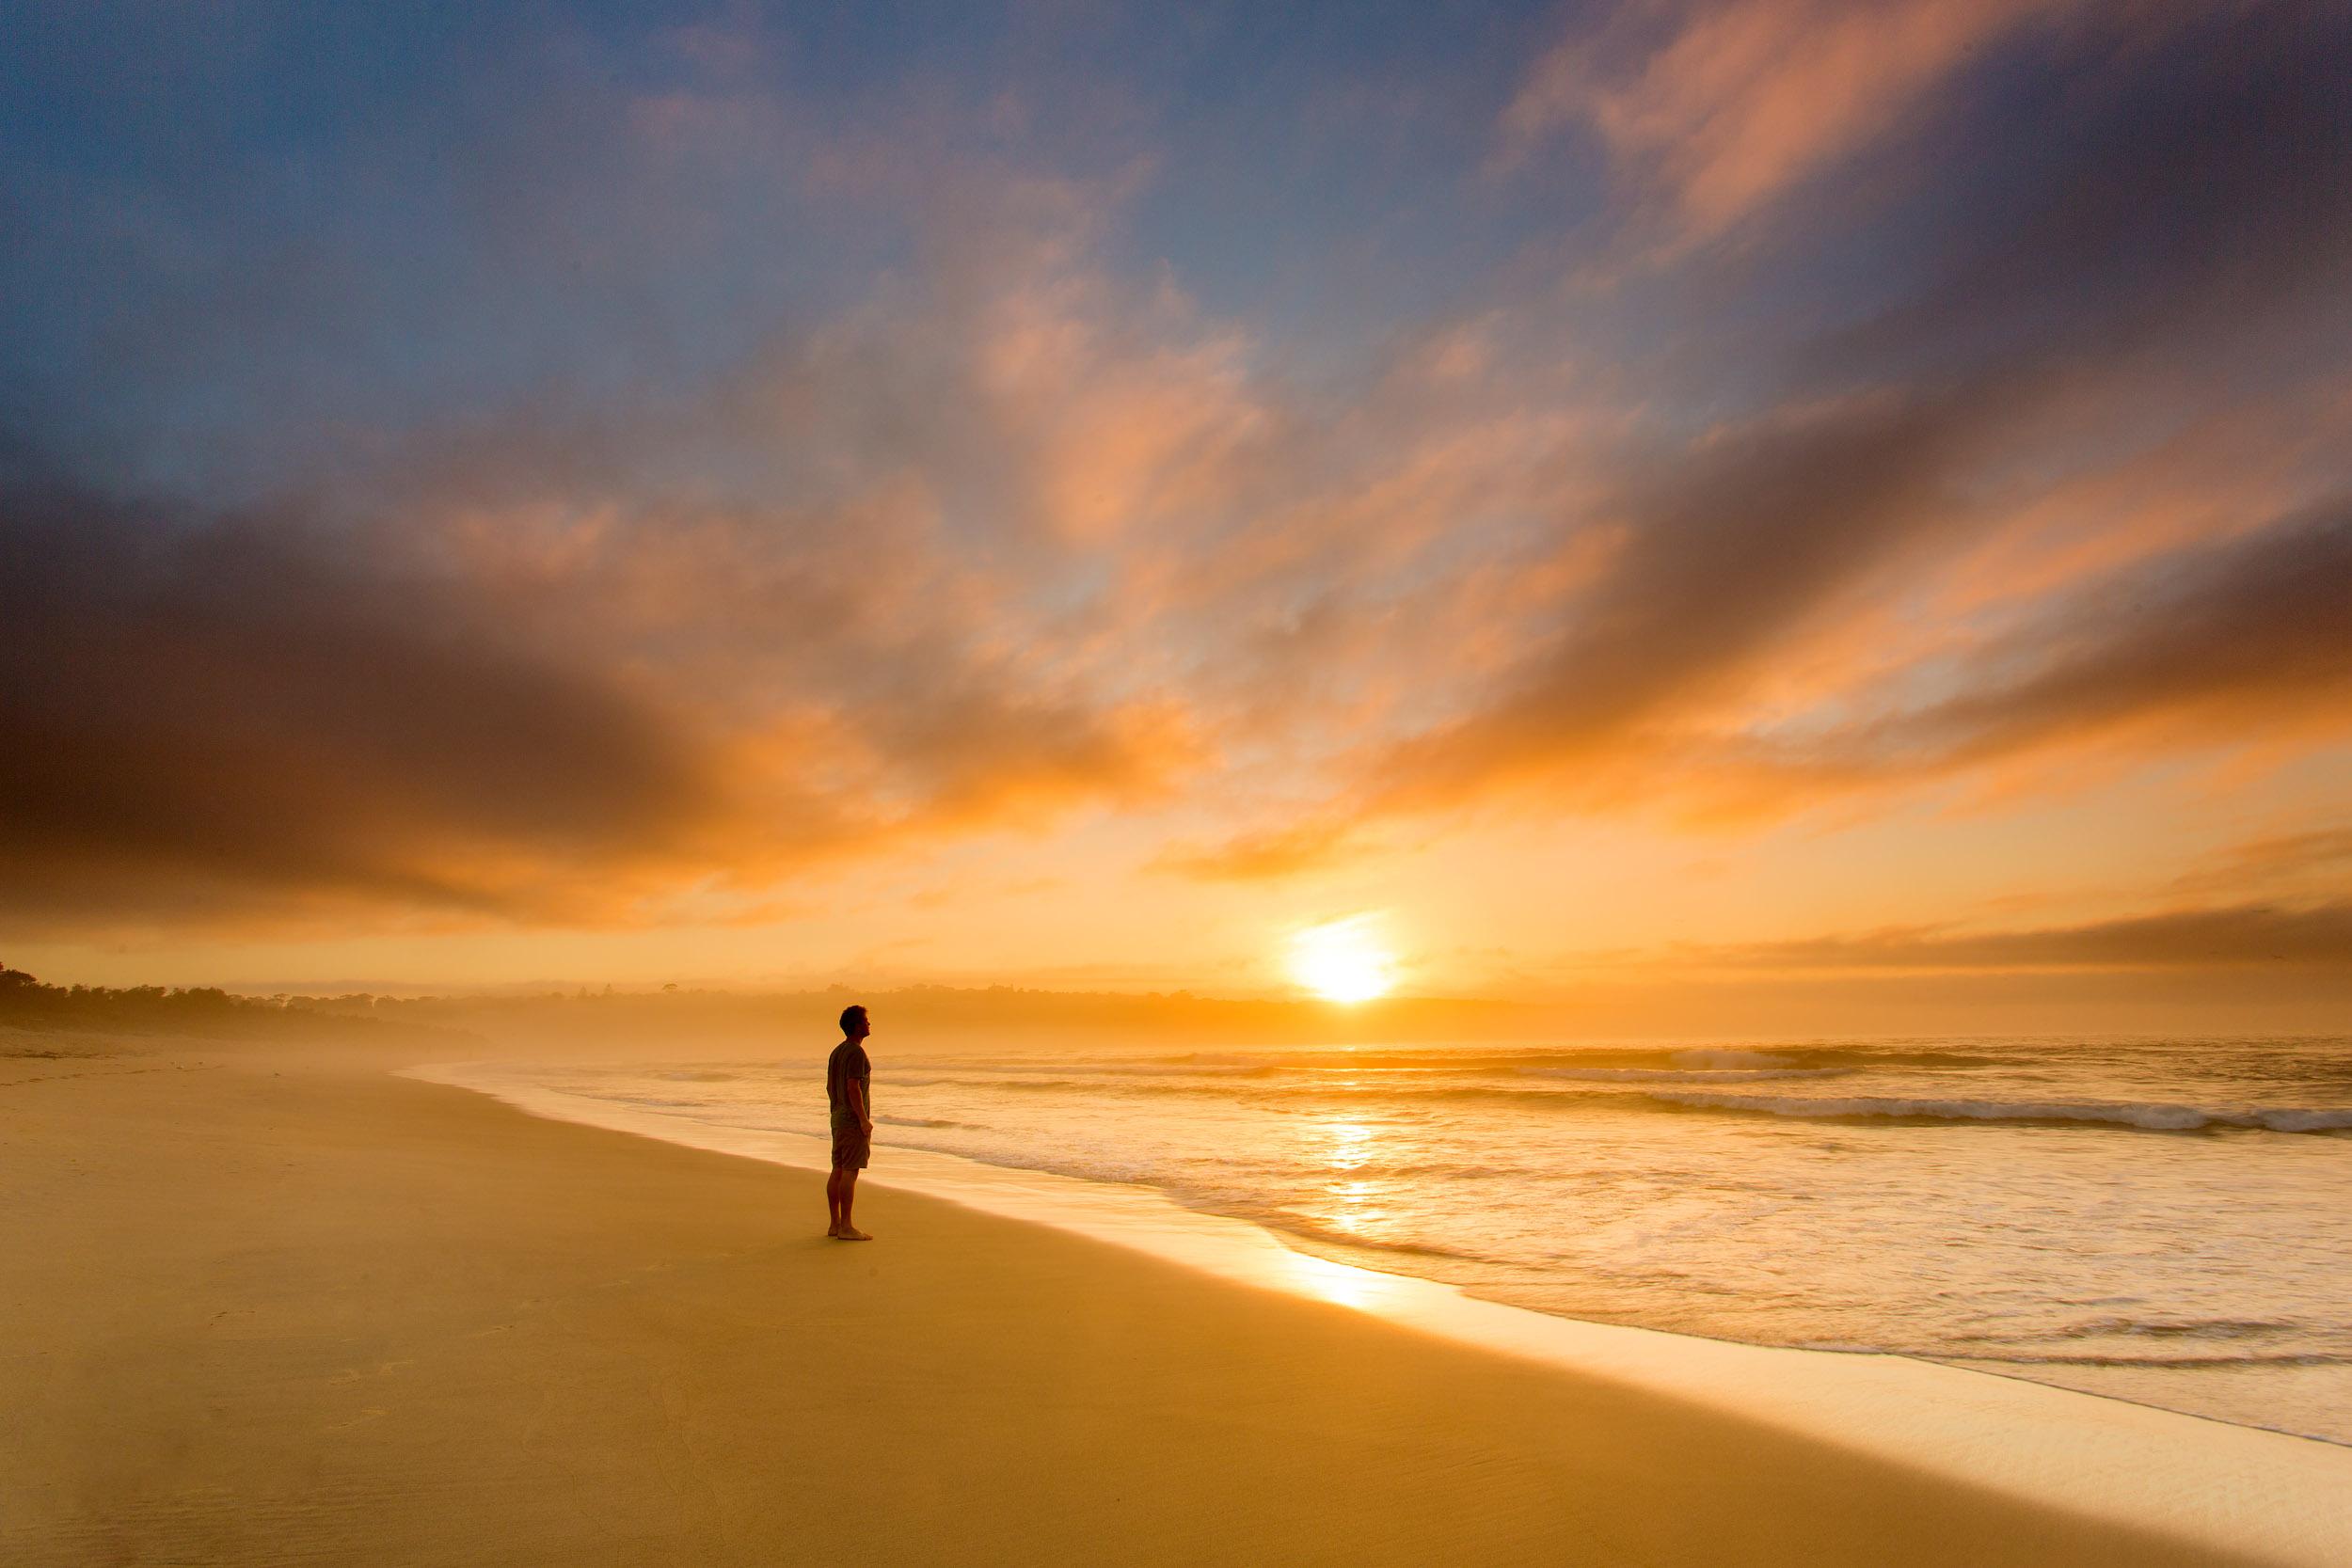 sunrise-south-coast-beach.jpg